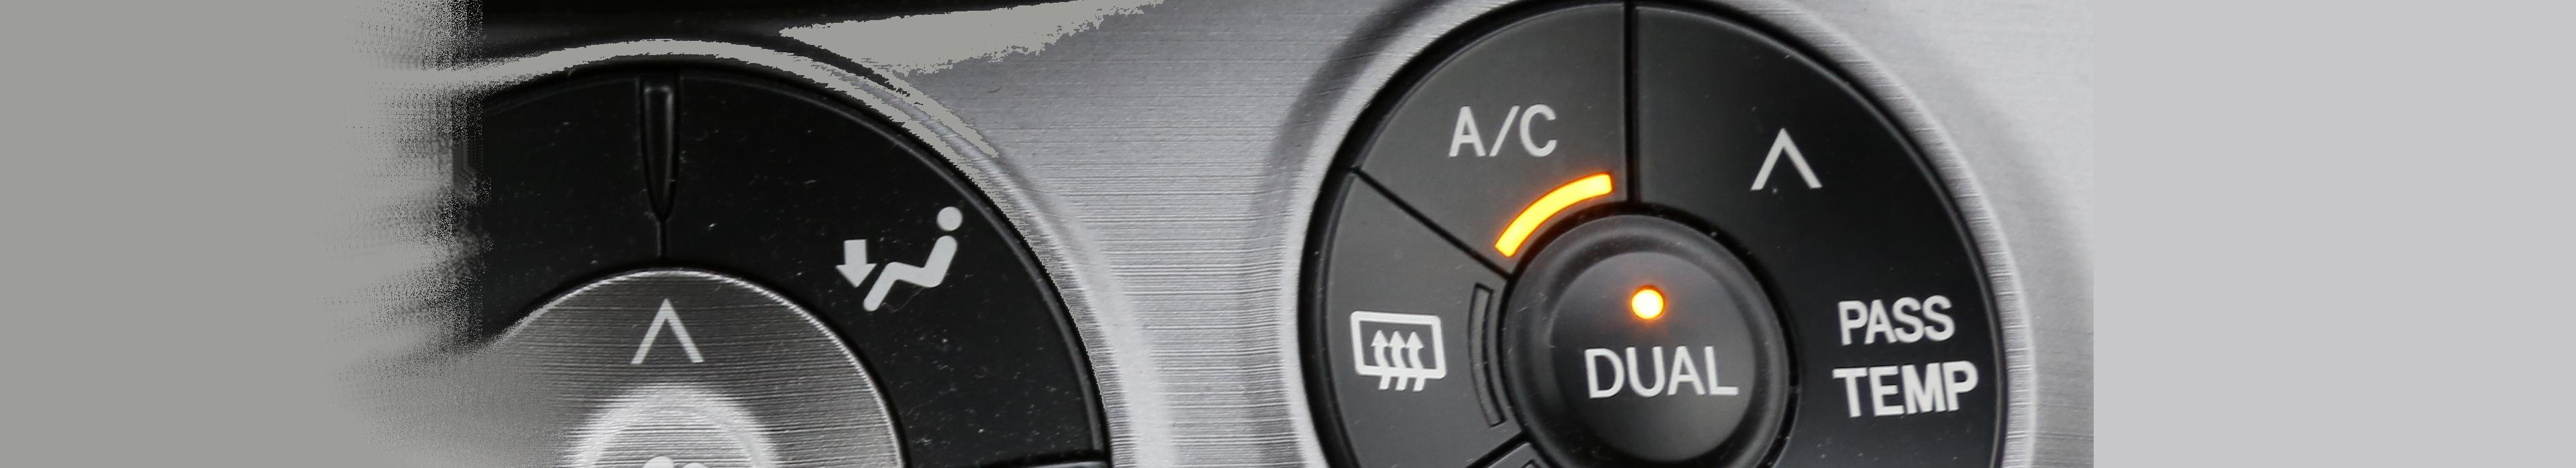 Auto airco check service vullen Car Cool Systems Helmond Uden